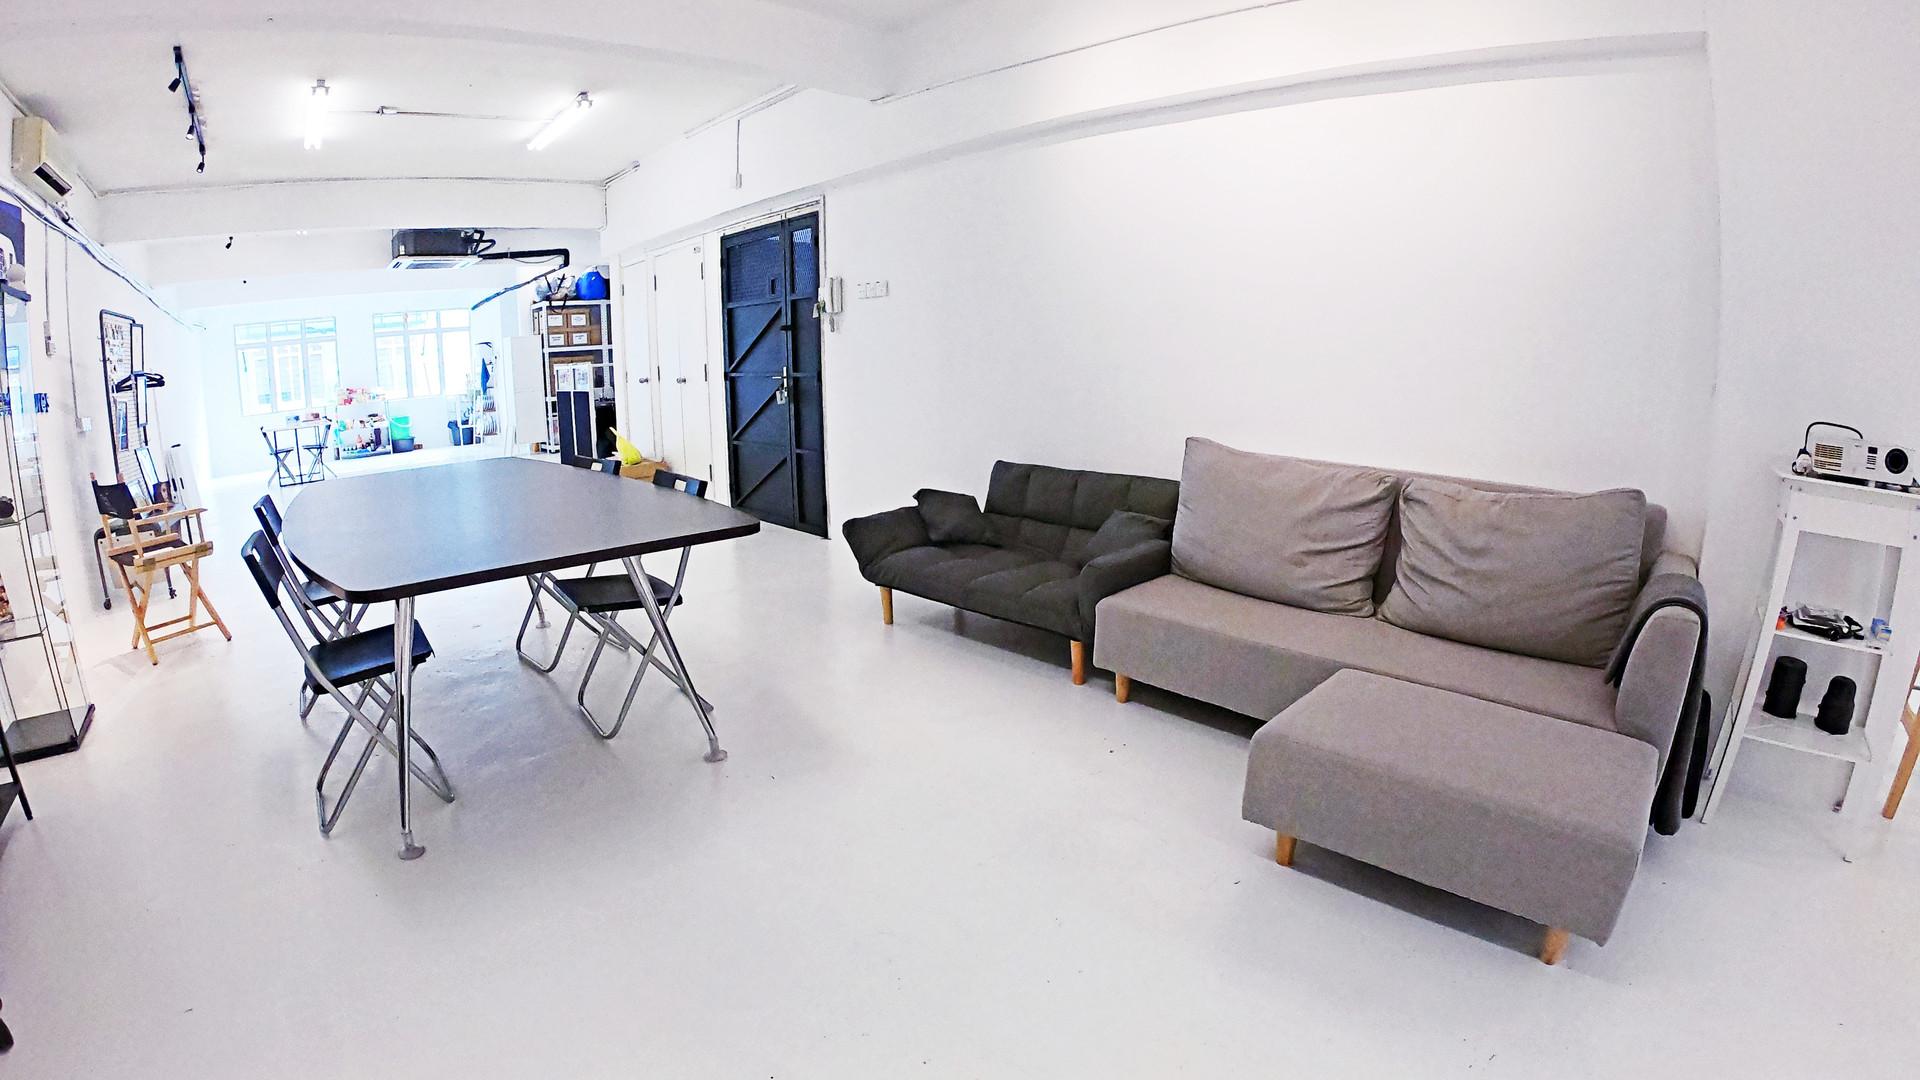 TheNextPictures_HoldingArea&MeetingSpace